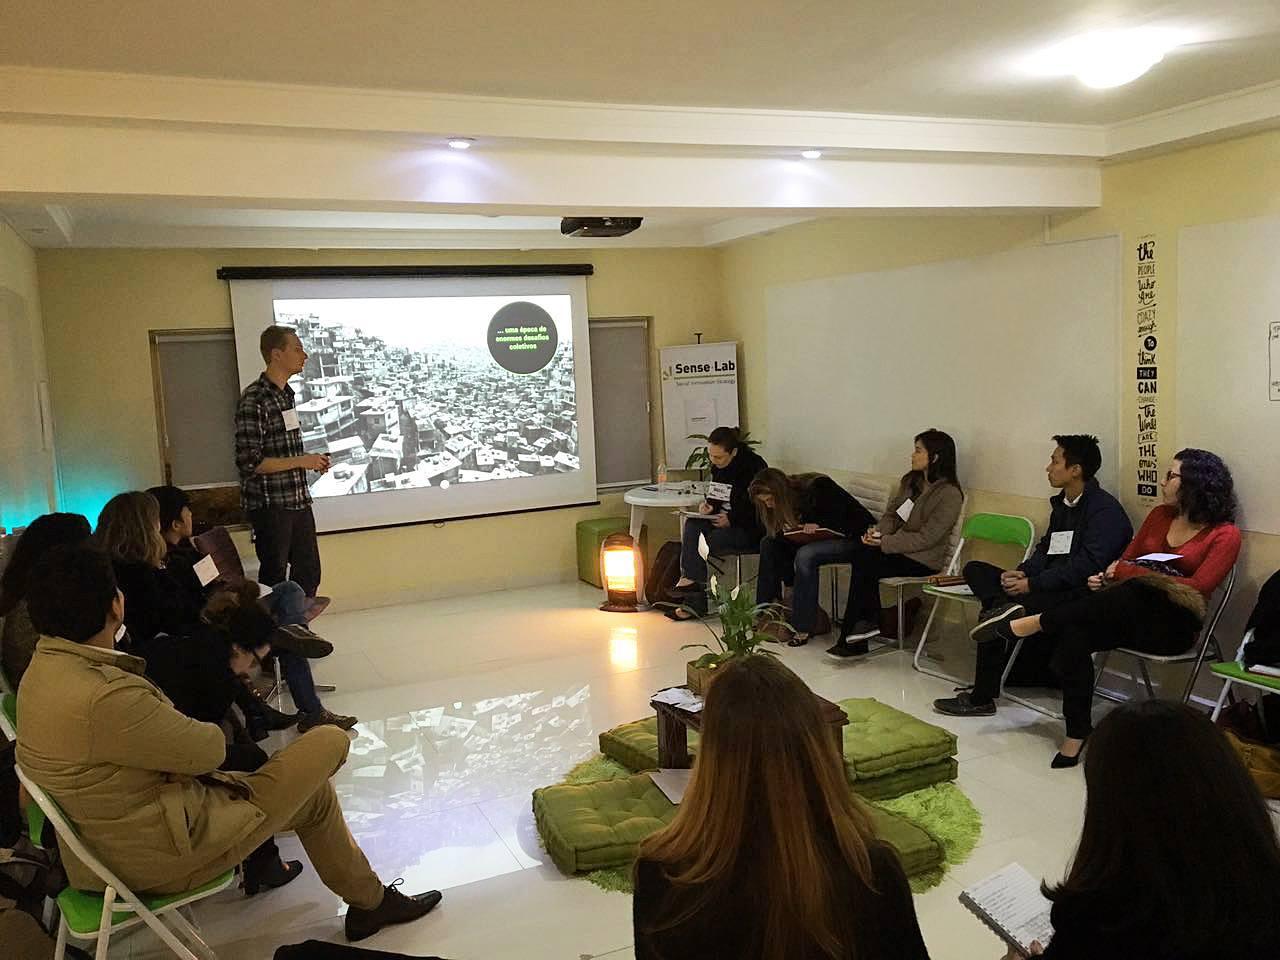 Business Design for Change Turma 04